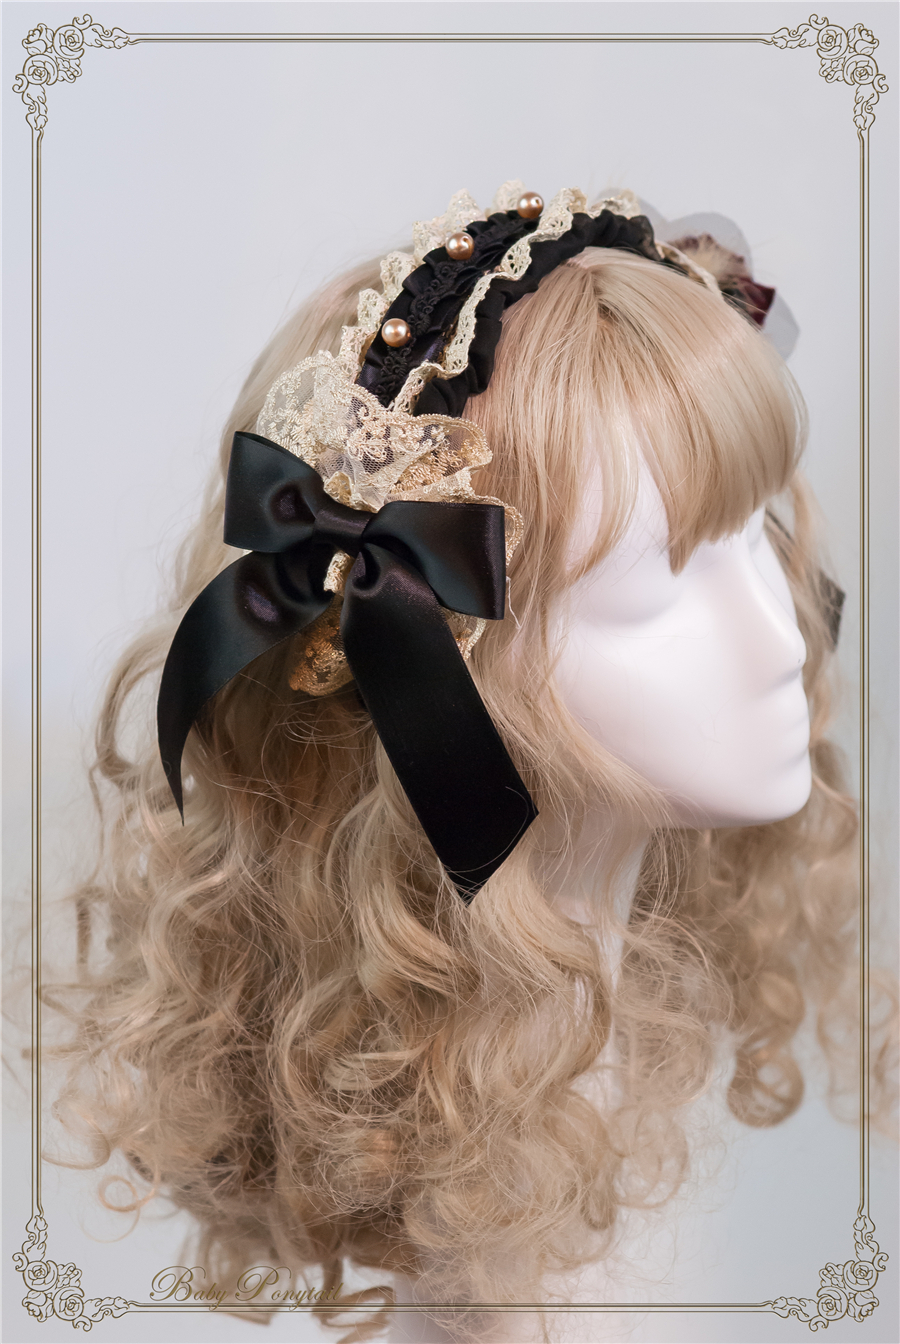 Baby Ponytail_Stock photo_Circus Princess_Rose Head Dress Black_03.jpg